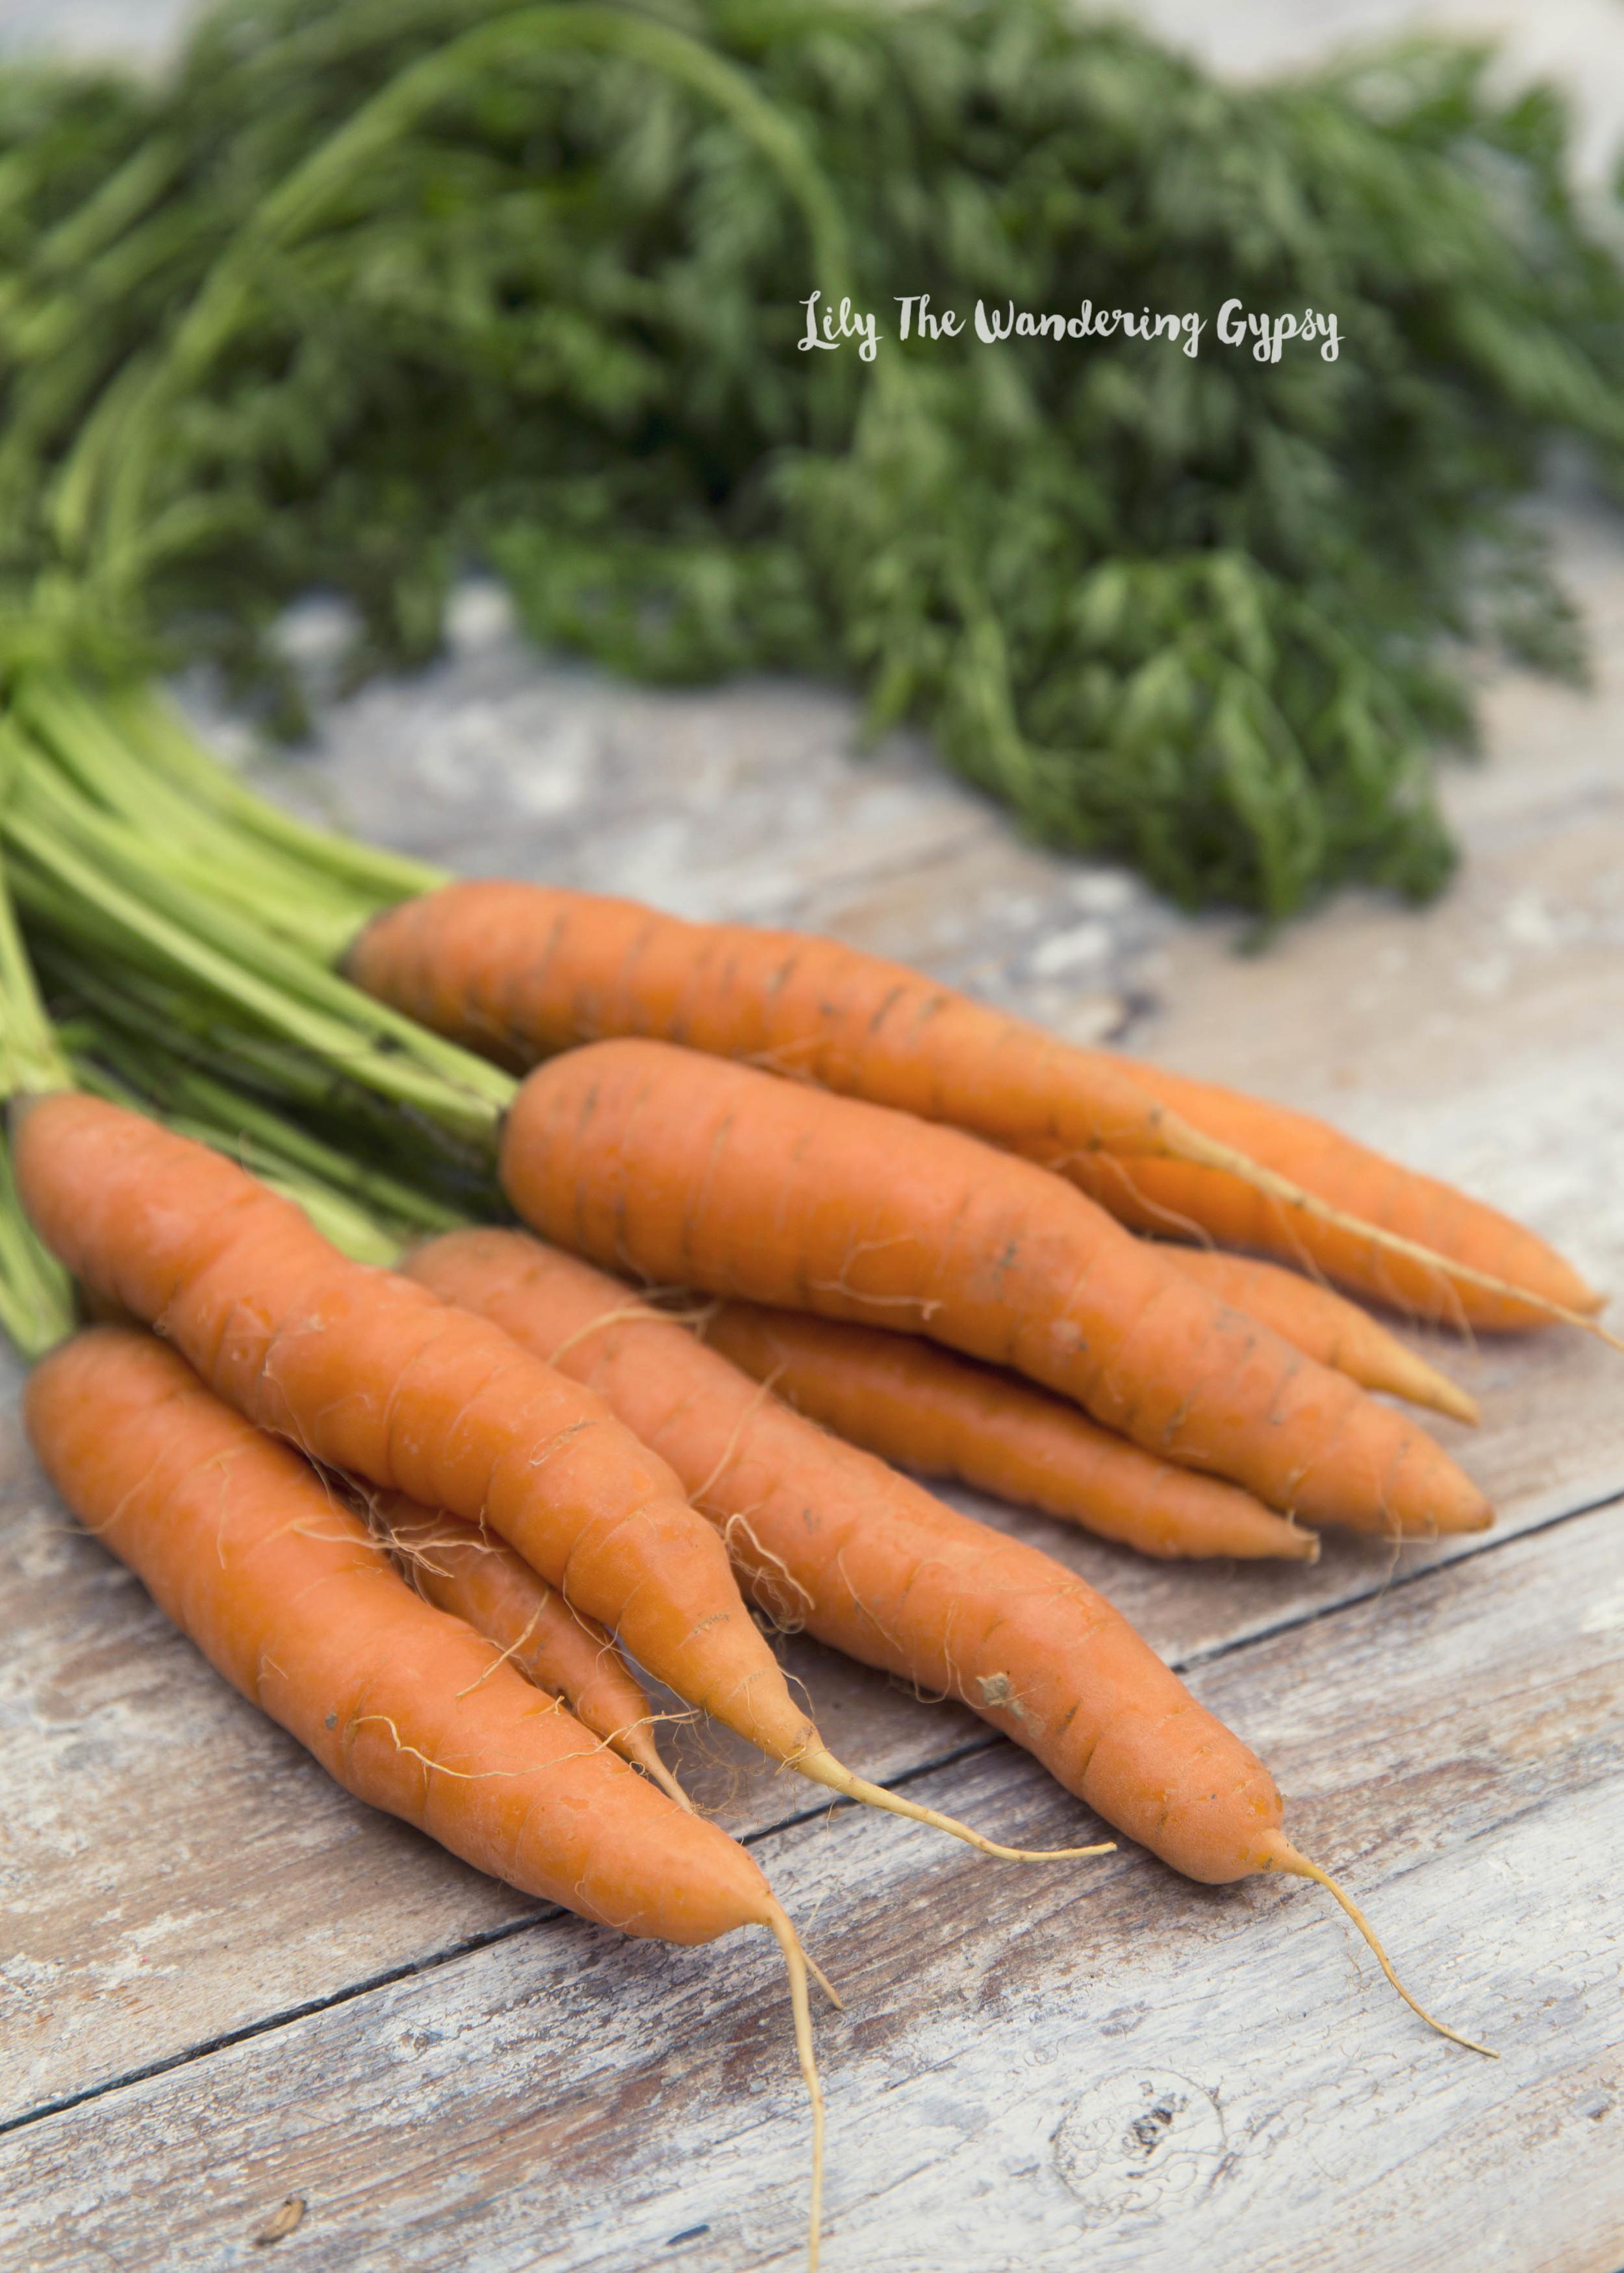 Fresh Carrots from Farmer's Market